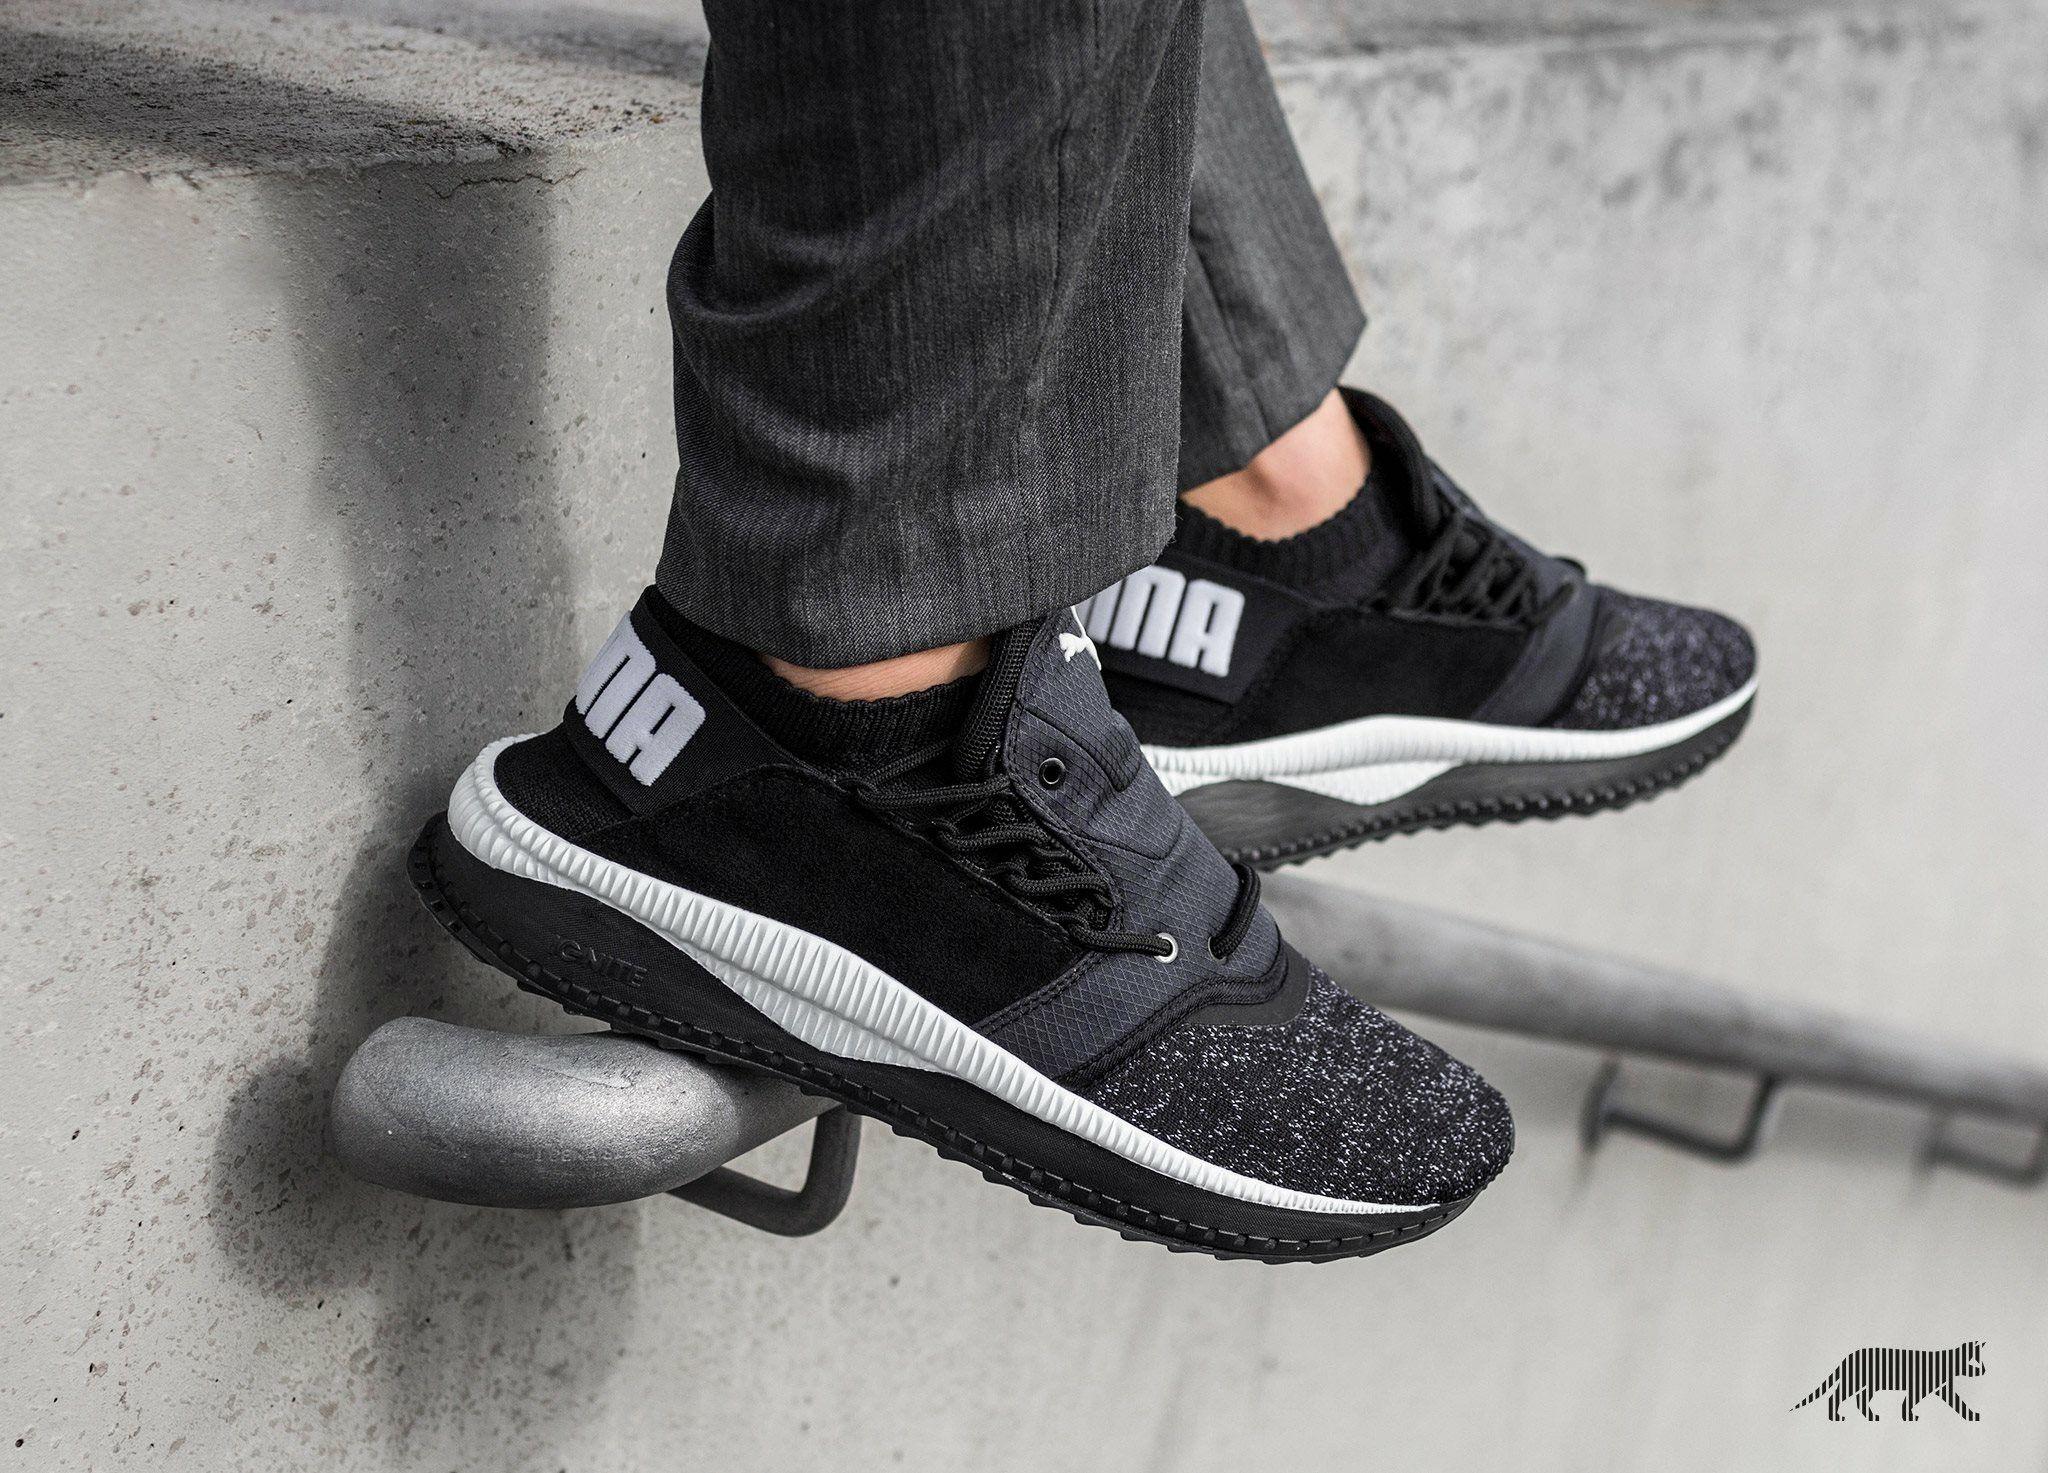 Puma Tsugi Shinsei: Black/White | Shoes